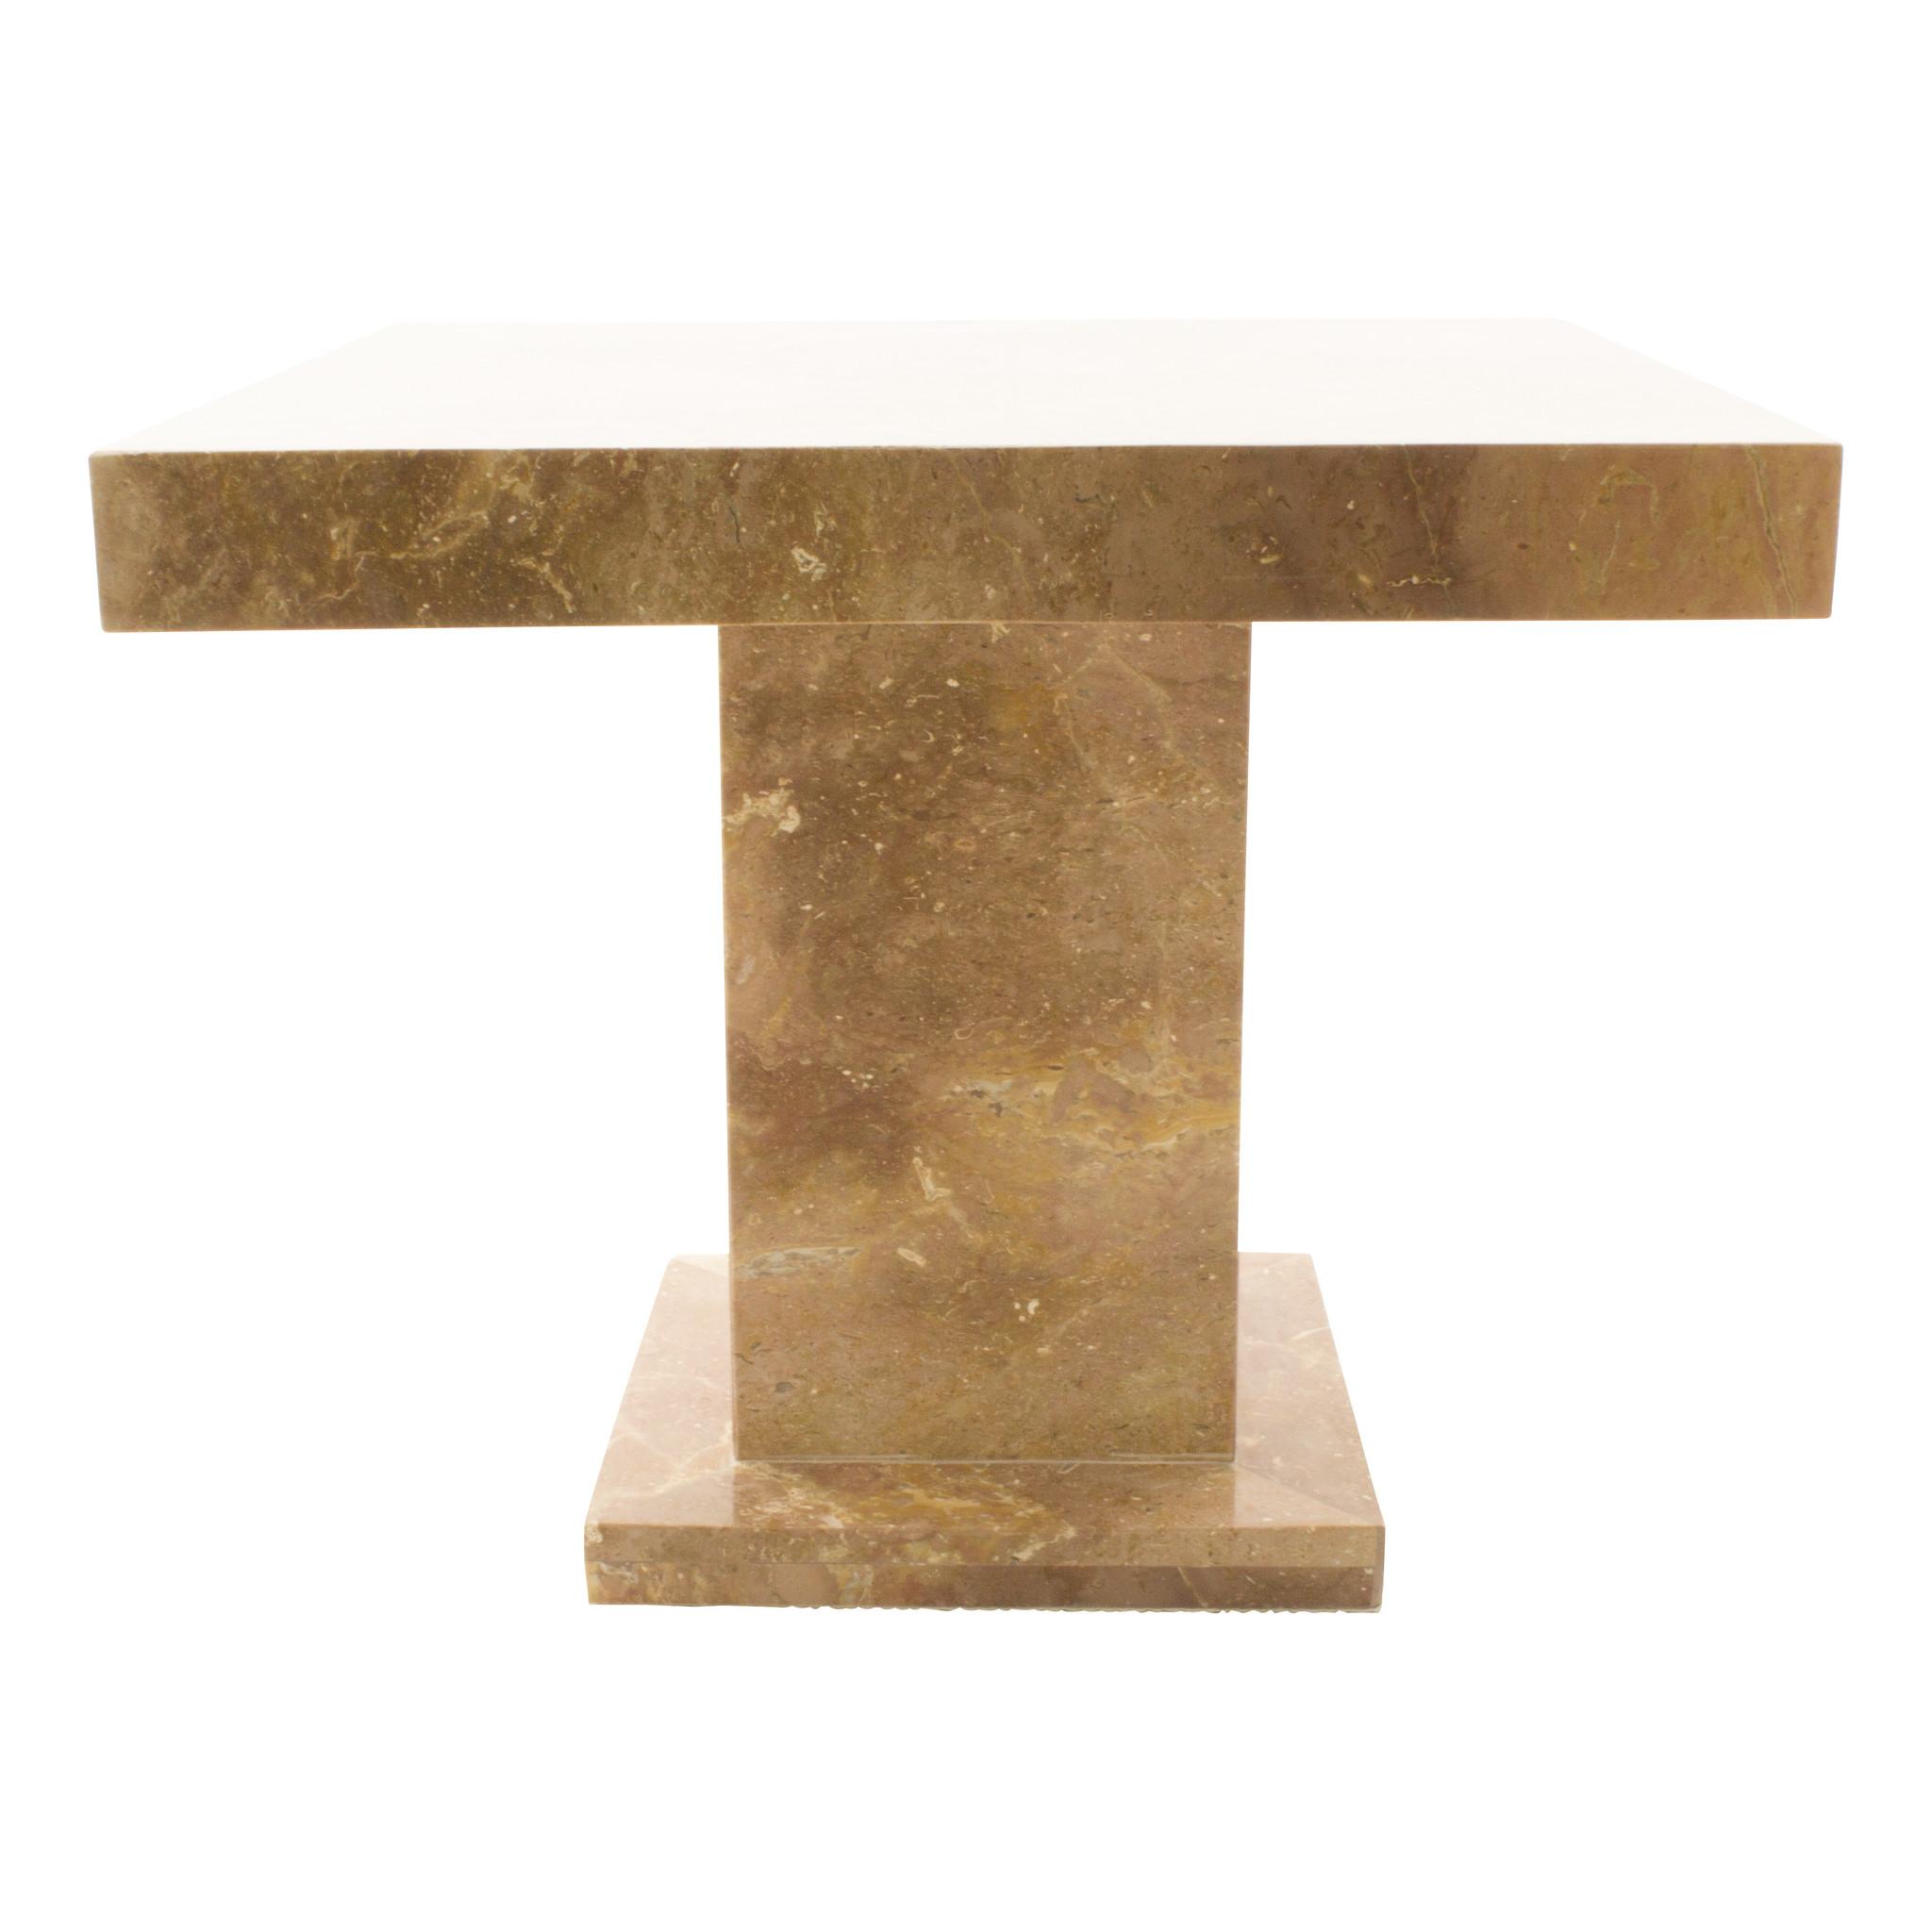 Indomarmer Beistelltisch Quadrat 50x50x40 cm Rotem Marmor